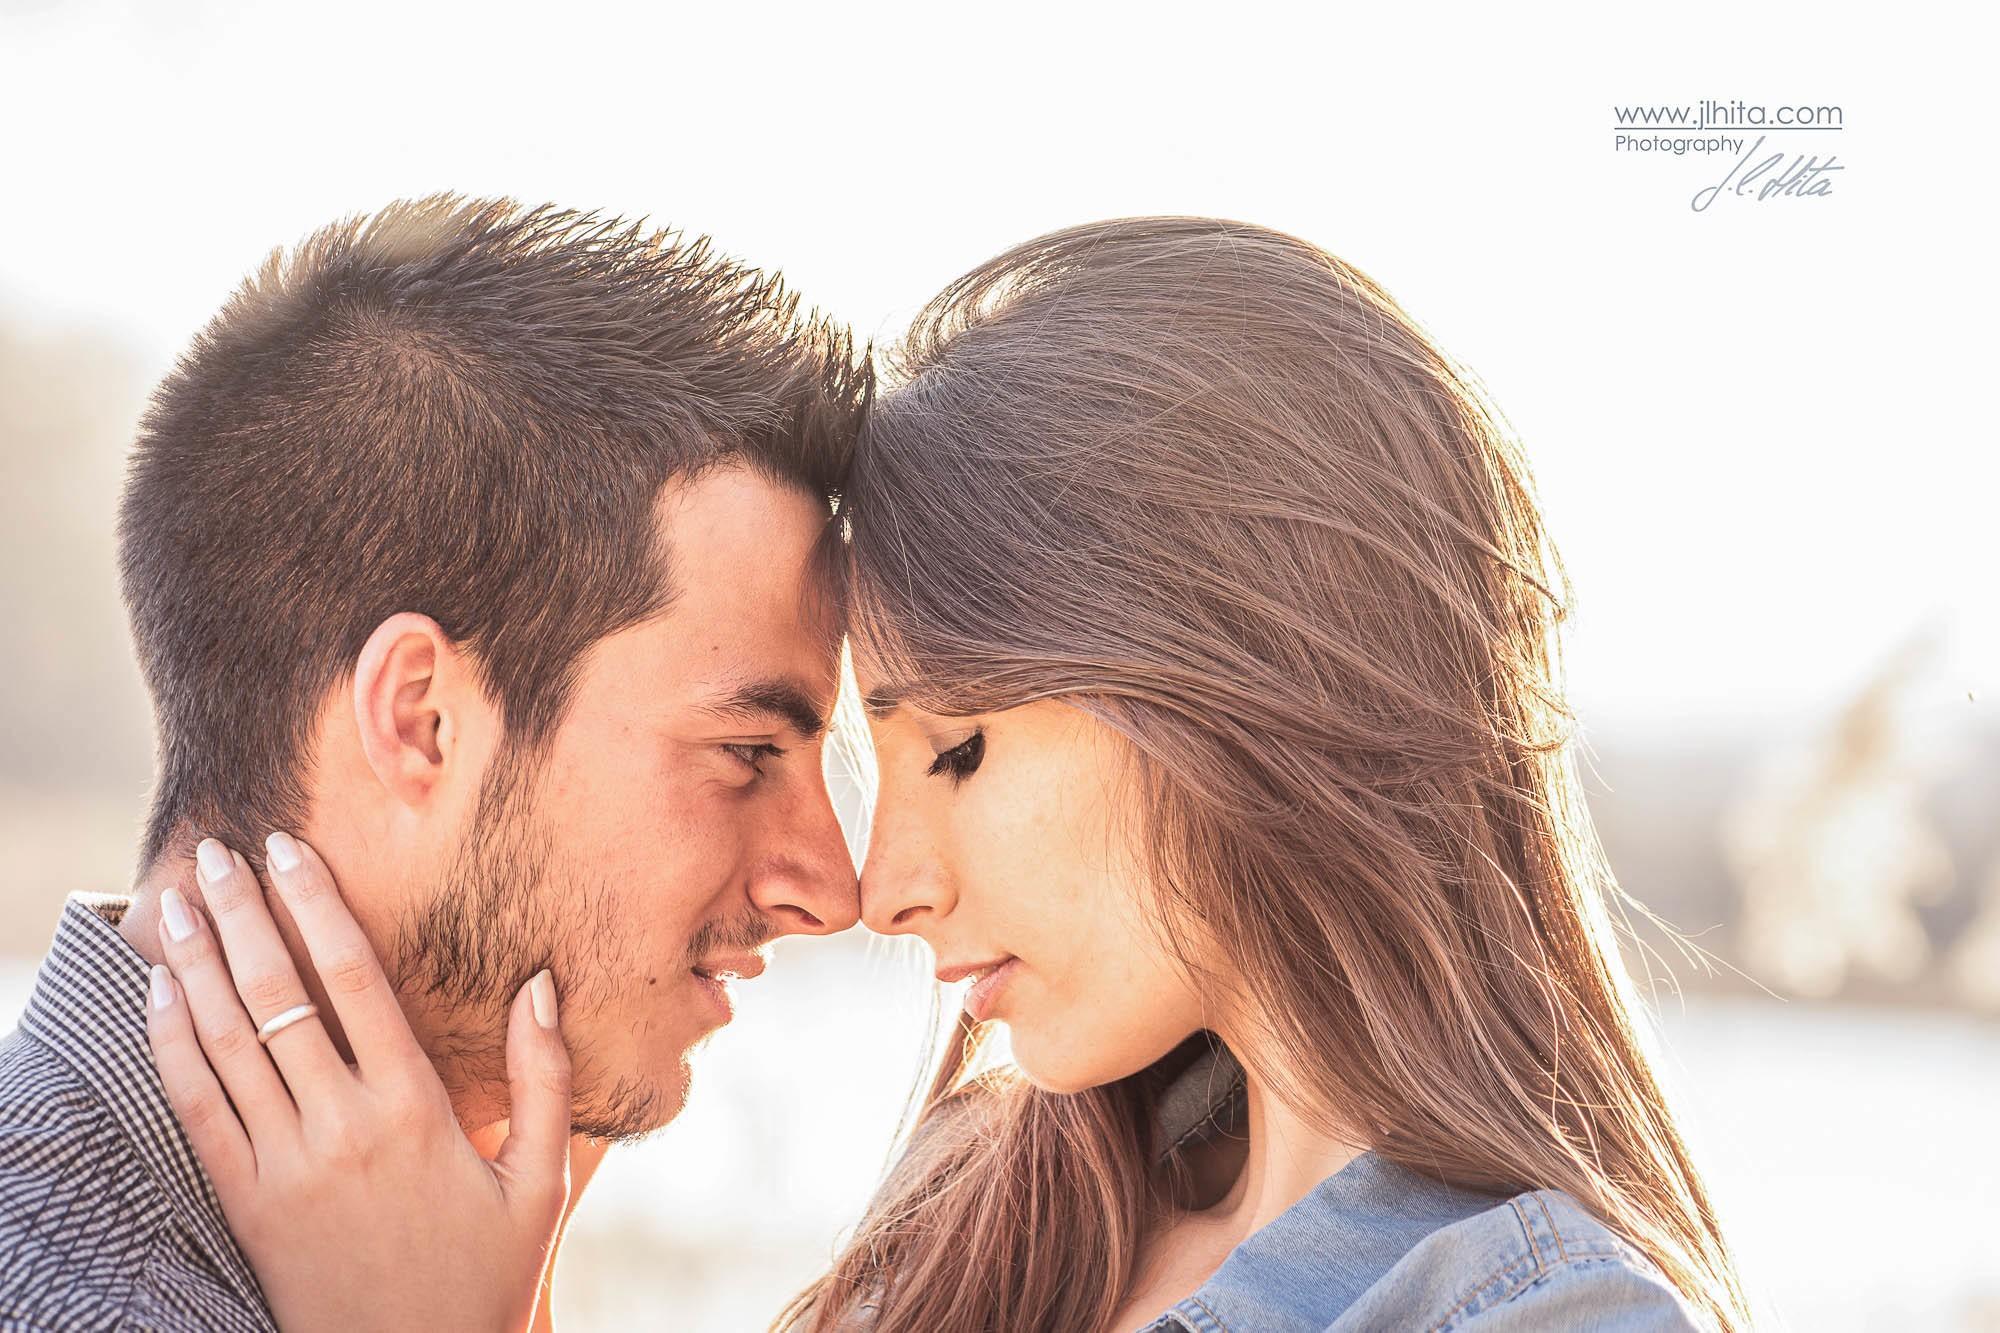 Frente con frente retrato de pareja